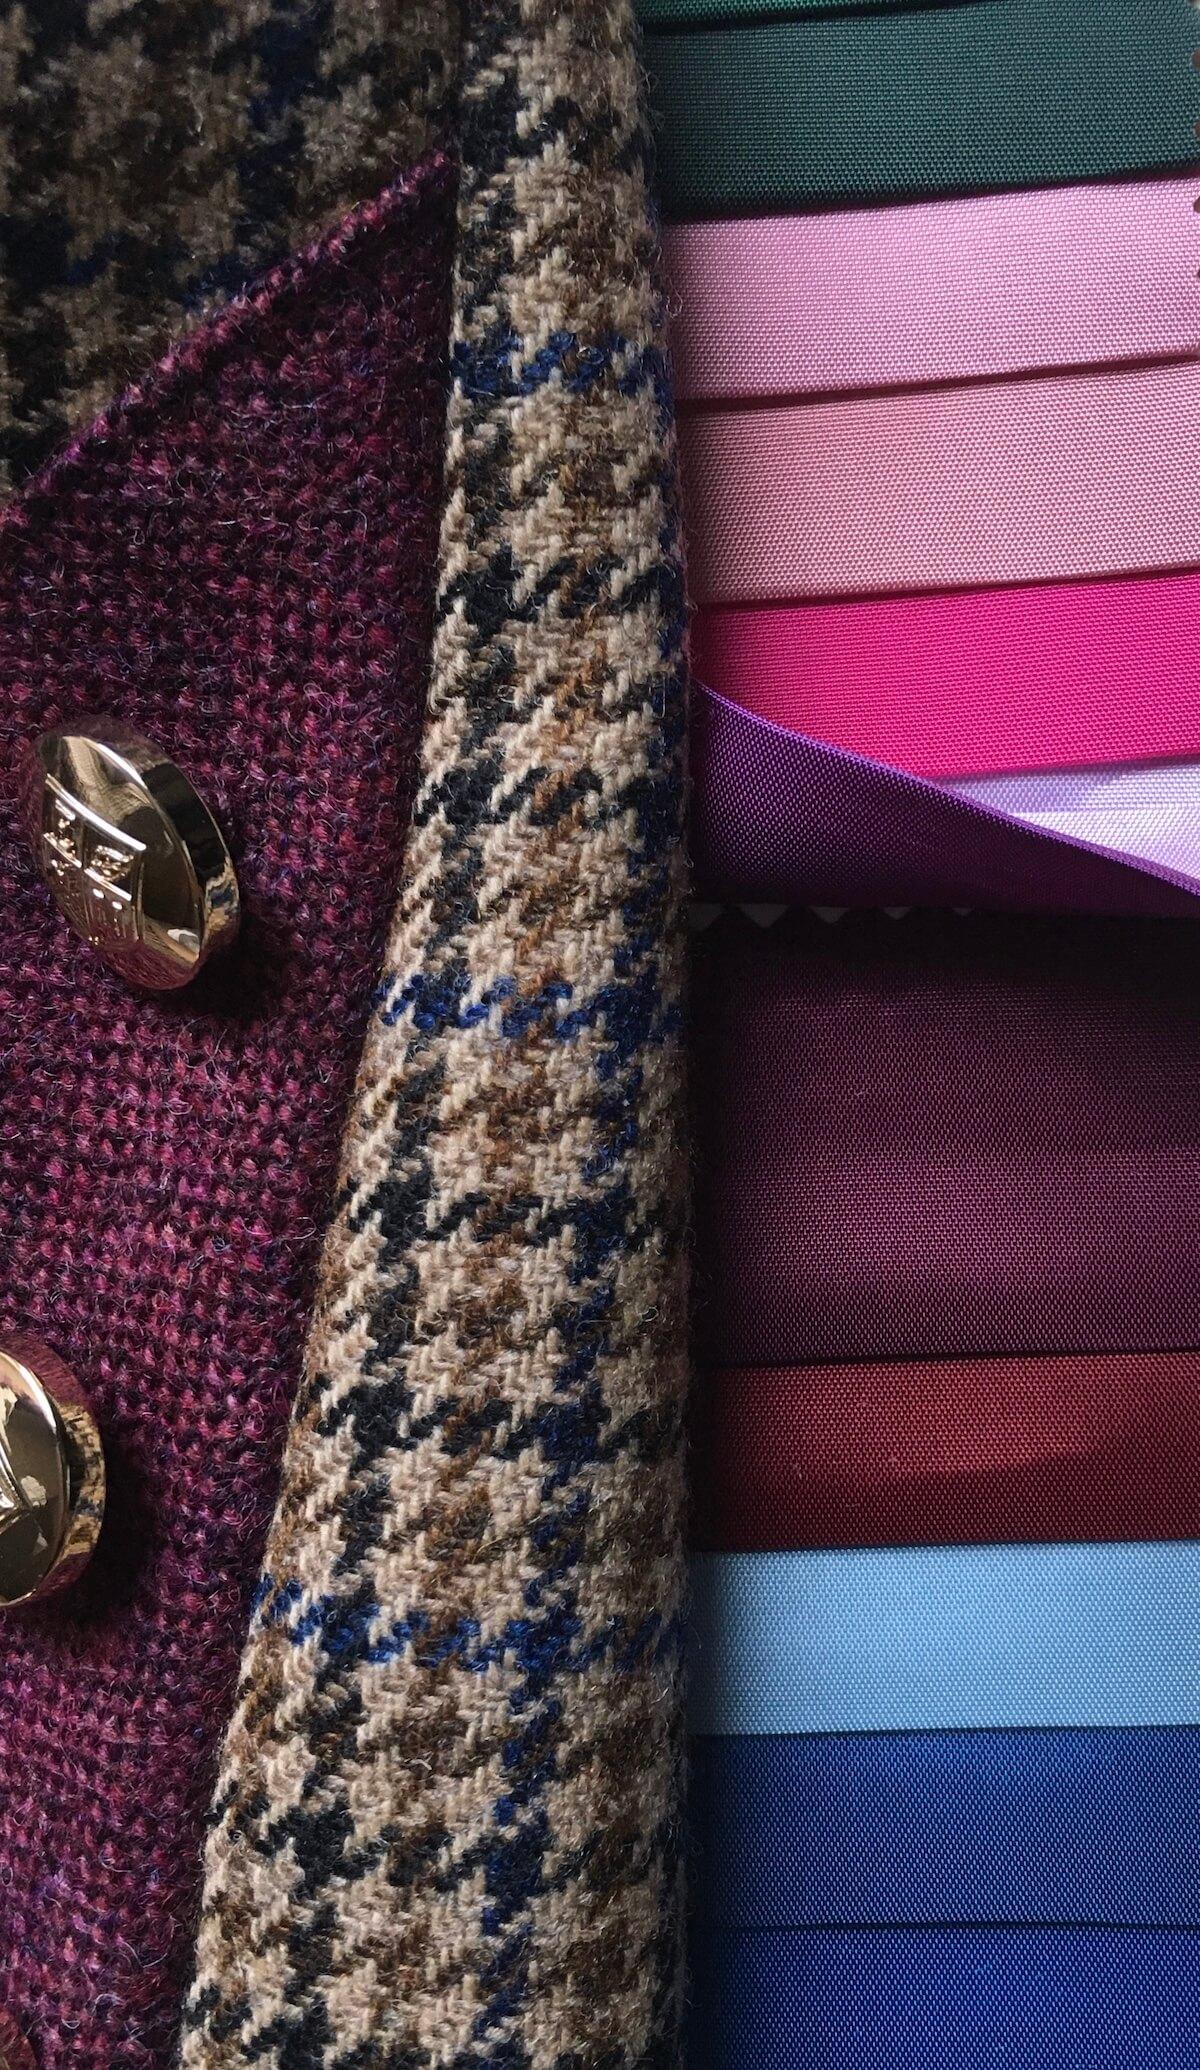 English Nettle - textiles